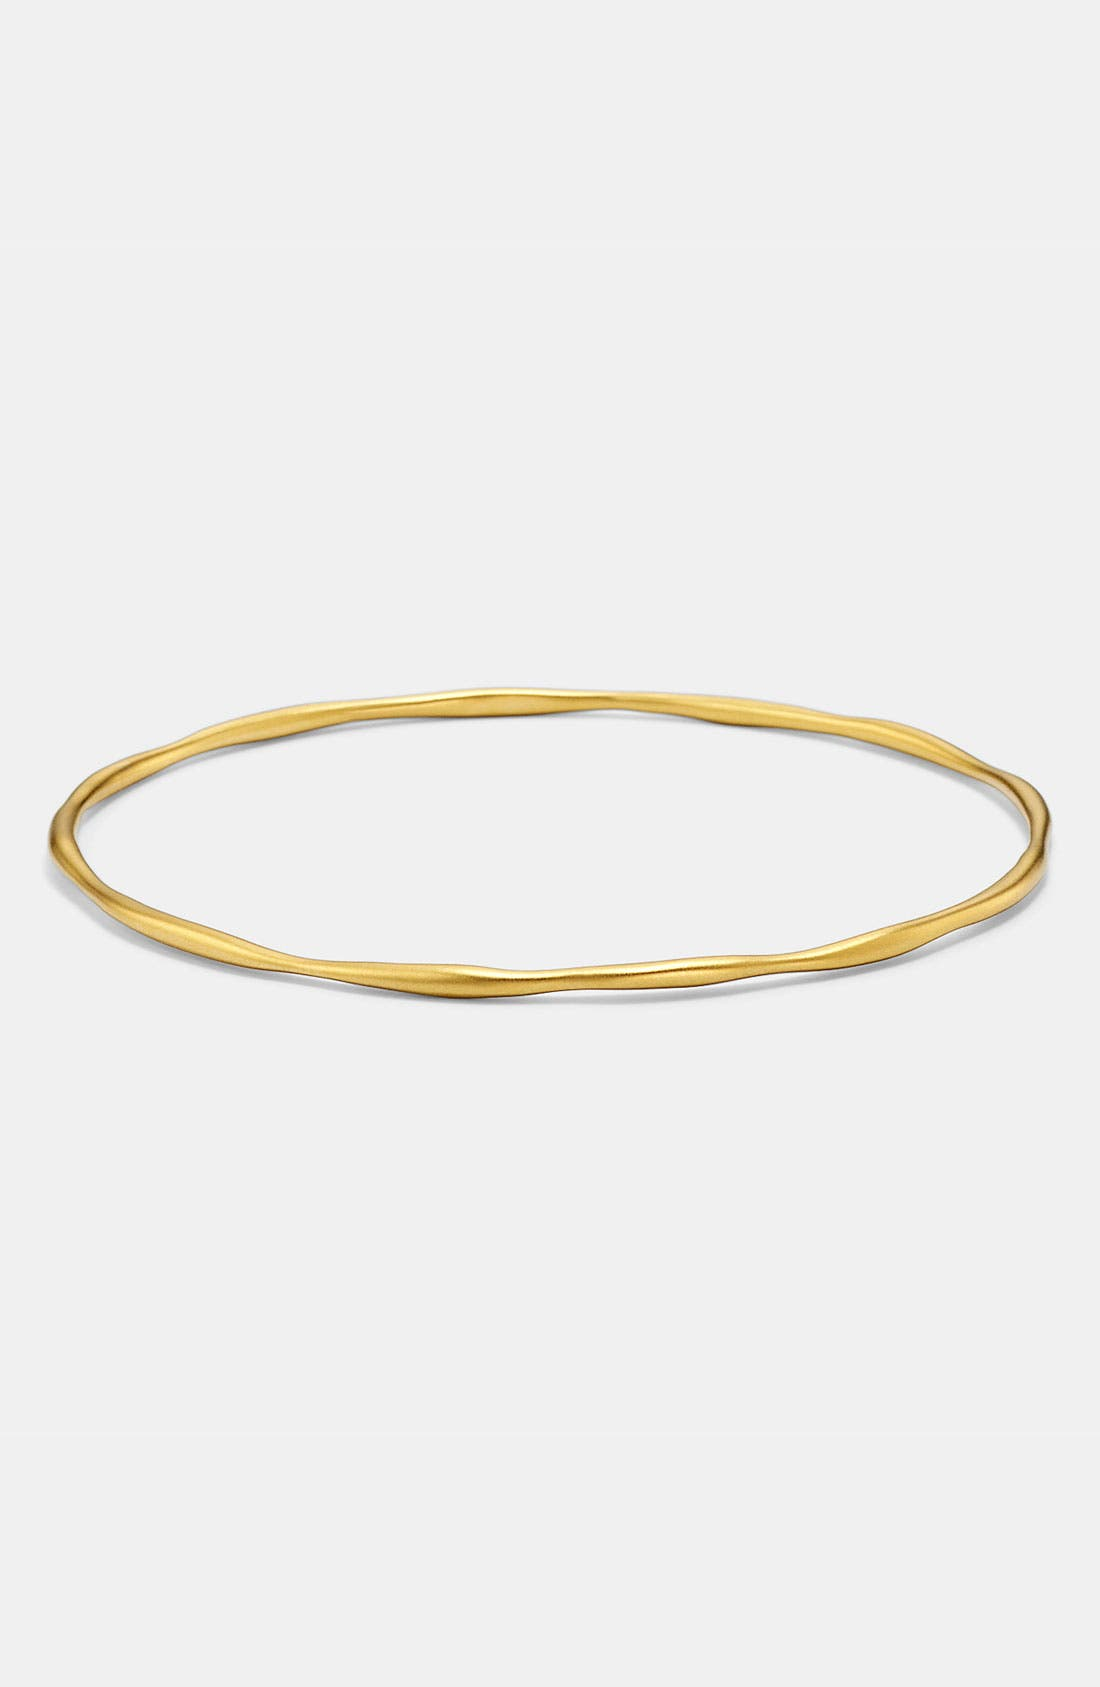 Alternate Image 1 Selected - Ippolita 'Plain' Matte 18k Gold Bangle